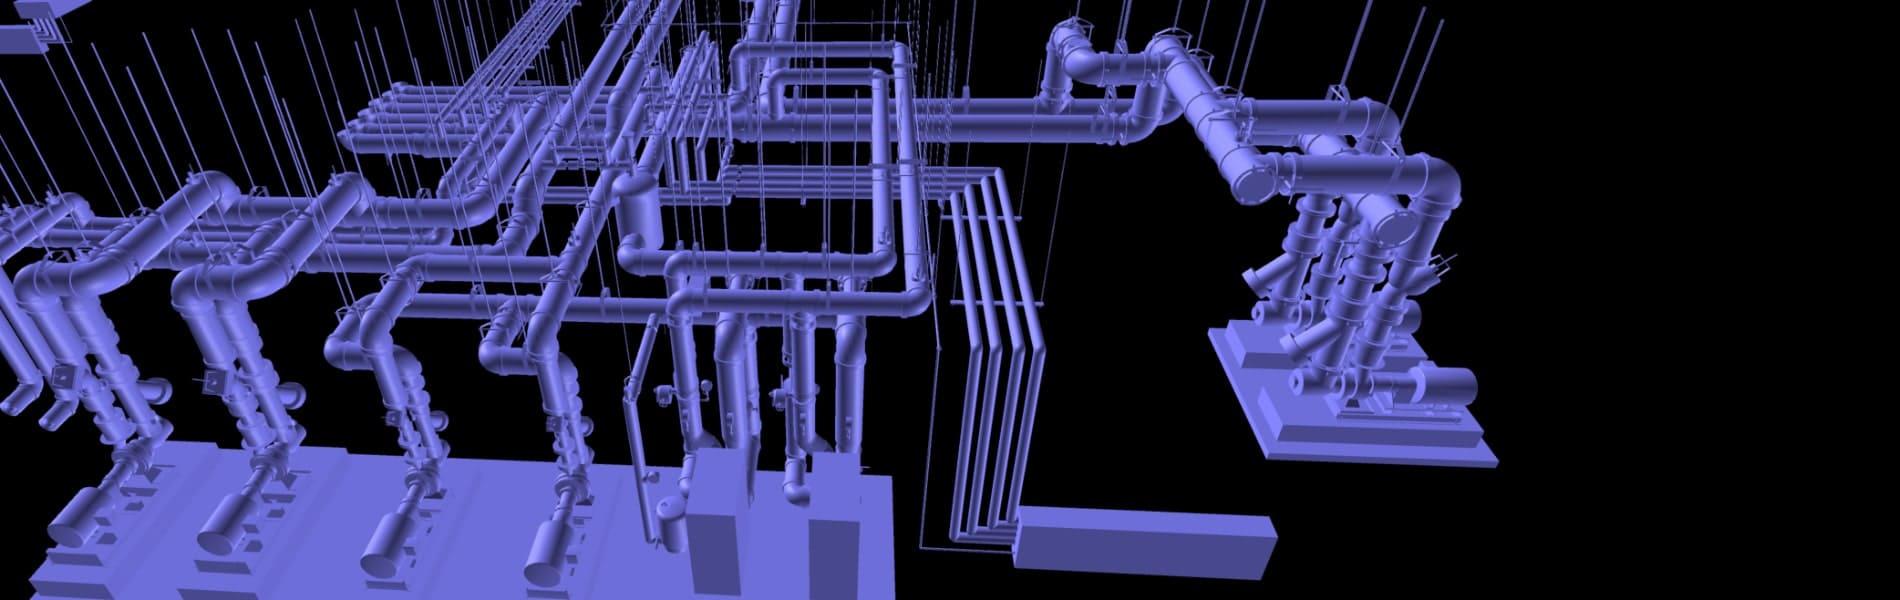 MEP (Mechanical, Electrical and Plumbing)